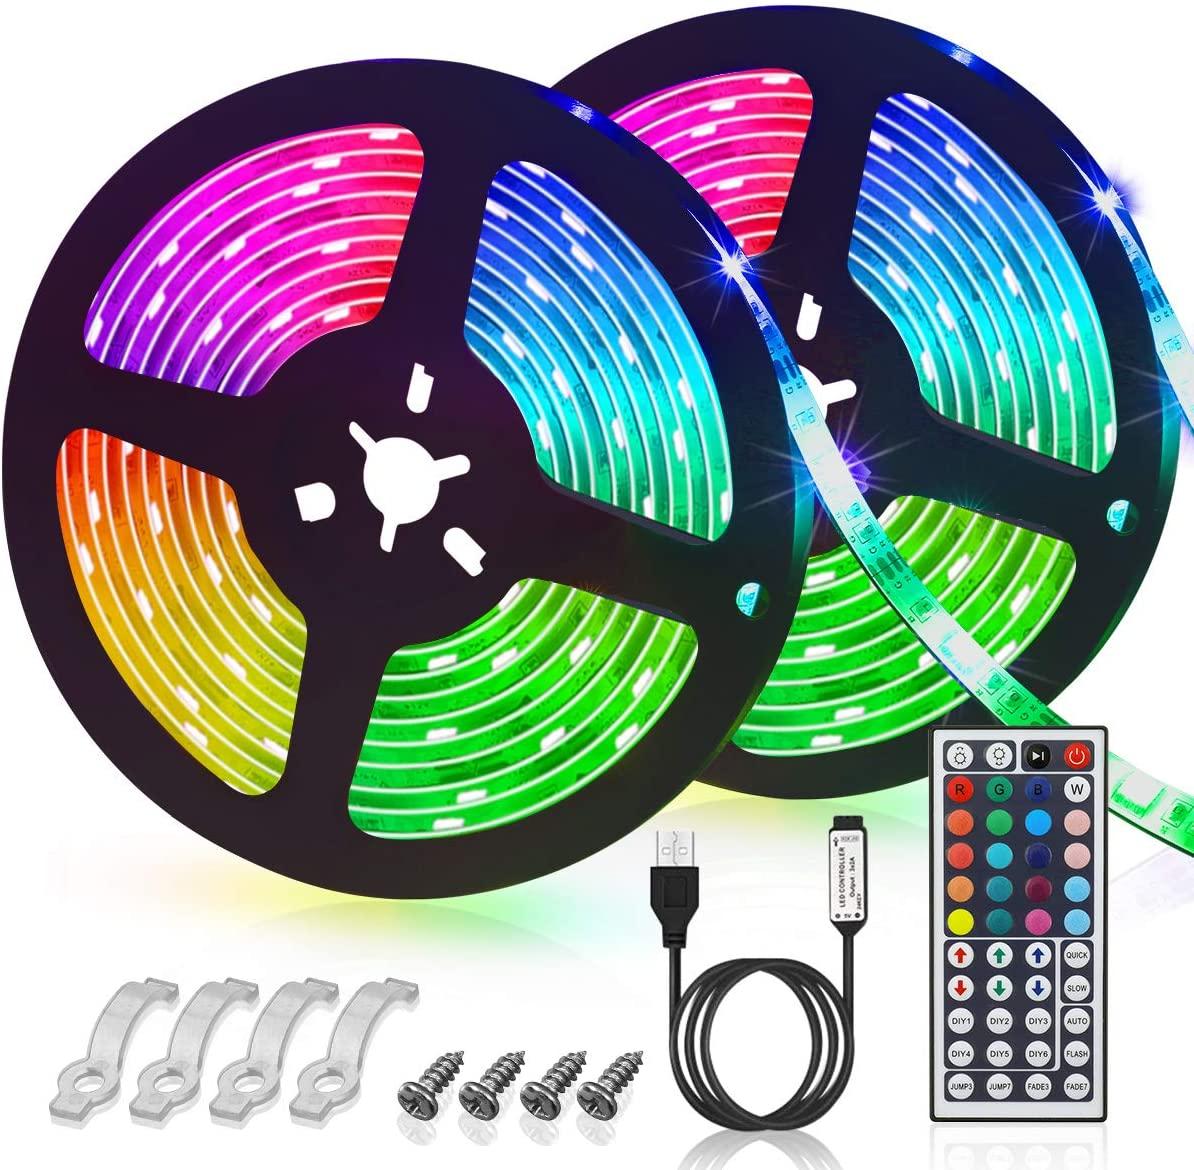 Bild zu GLIME 6M RGB LED-Streifen für 12,34€